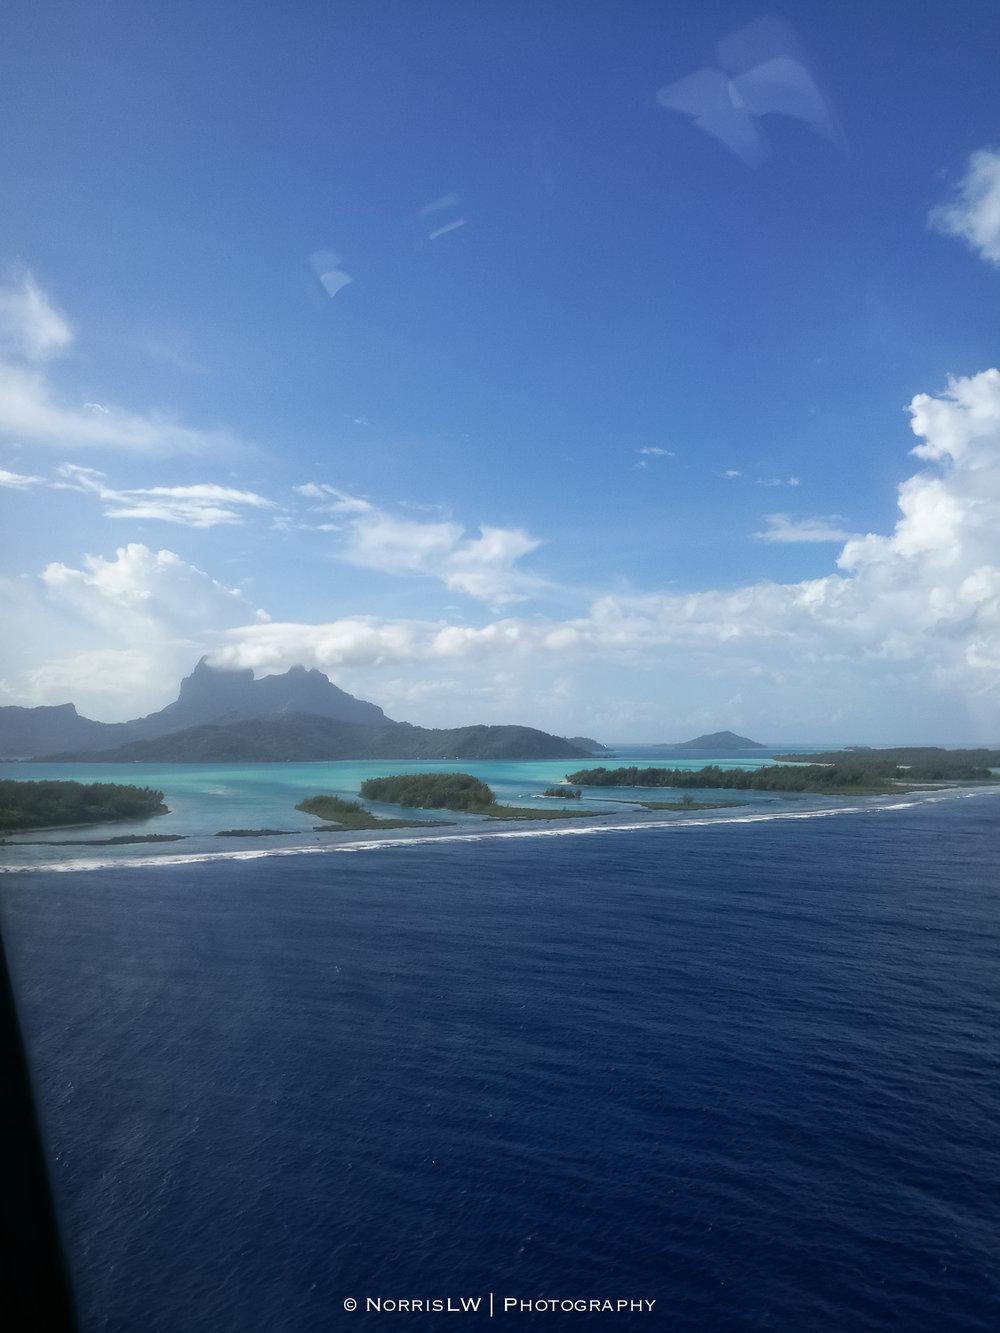 NorrisLWPhotography_Tahiti_BoraBora-20180123-006.jpg